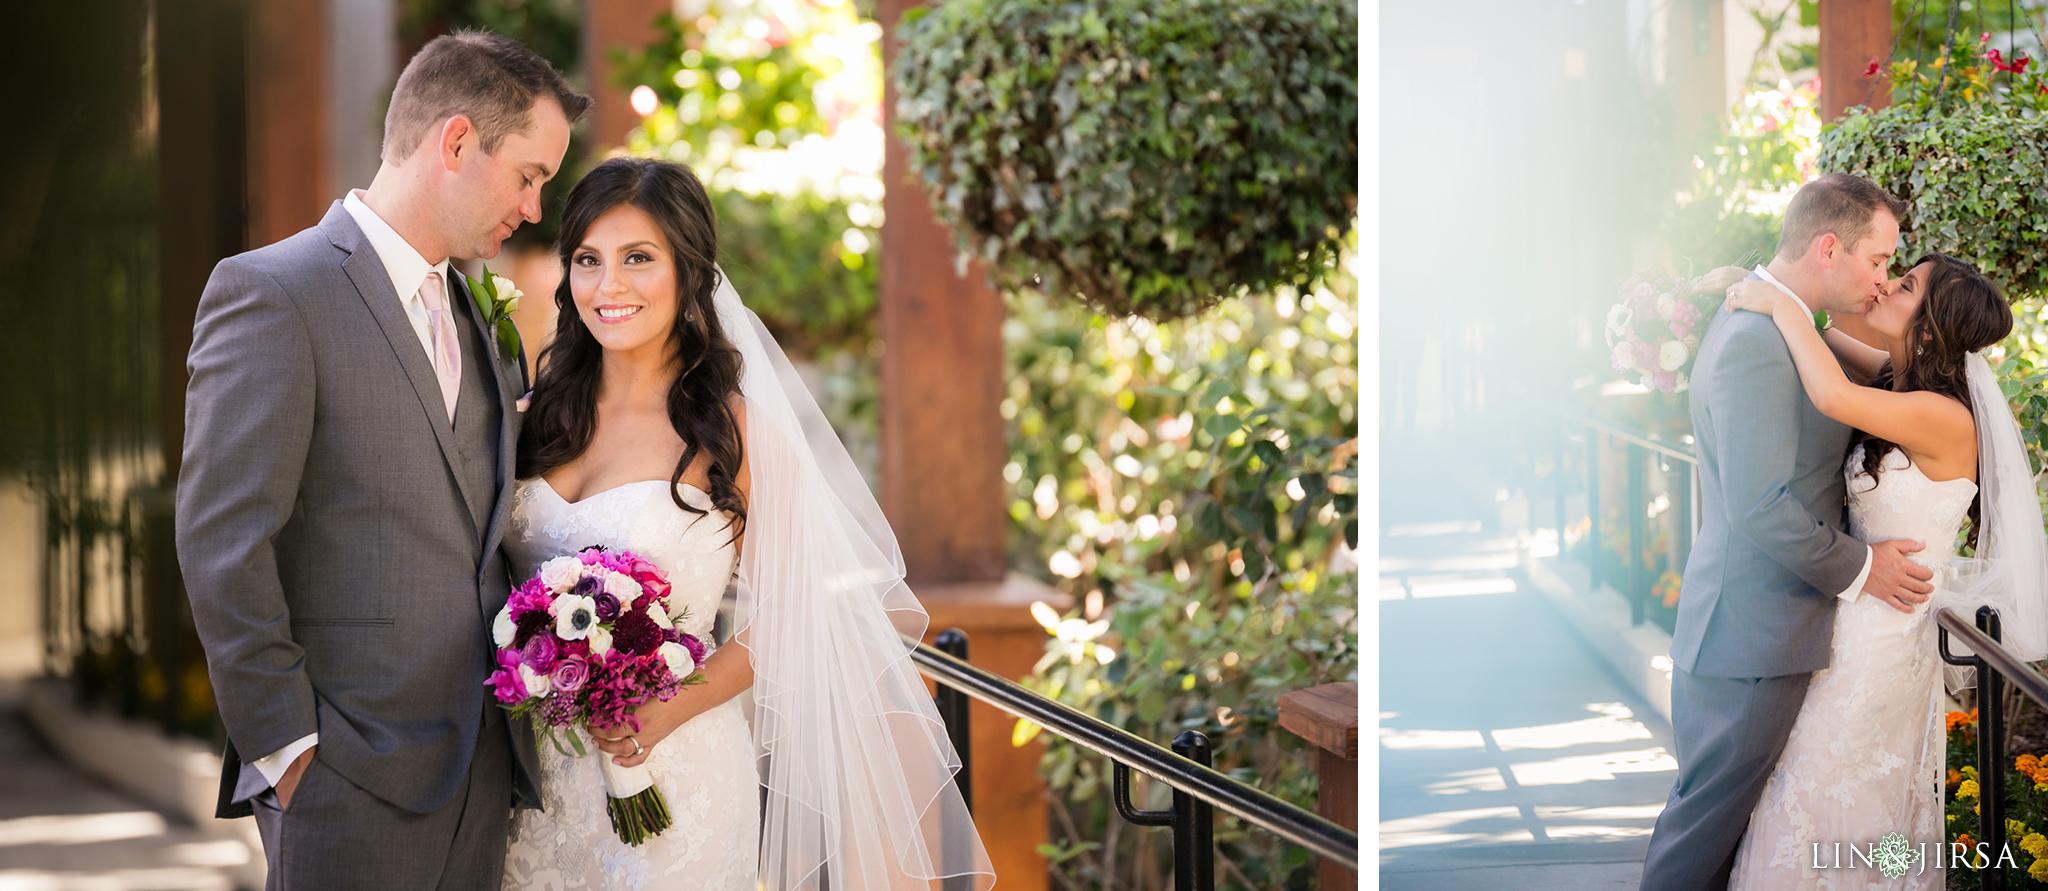 15-newport-beach-marriott-wedding-photography